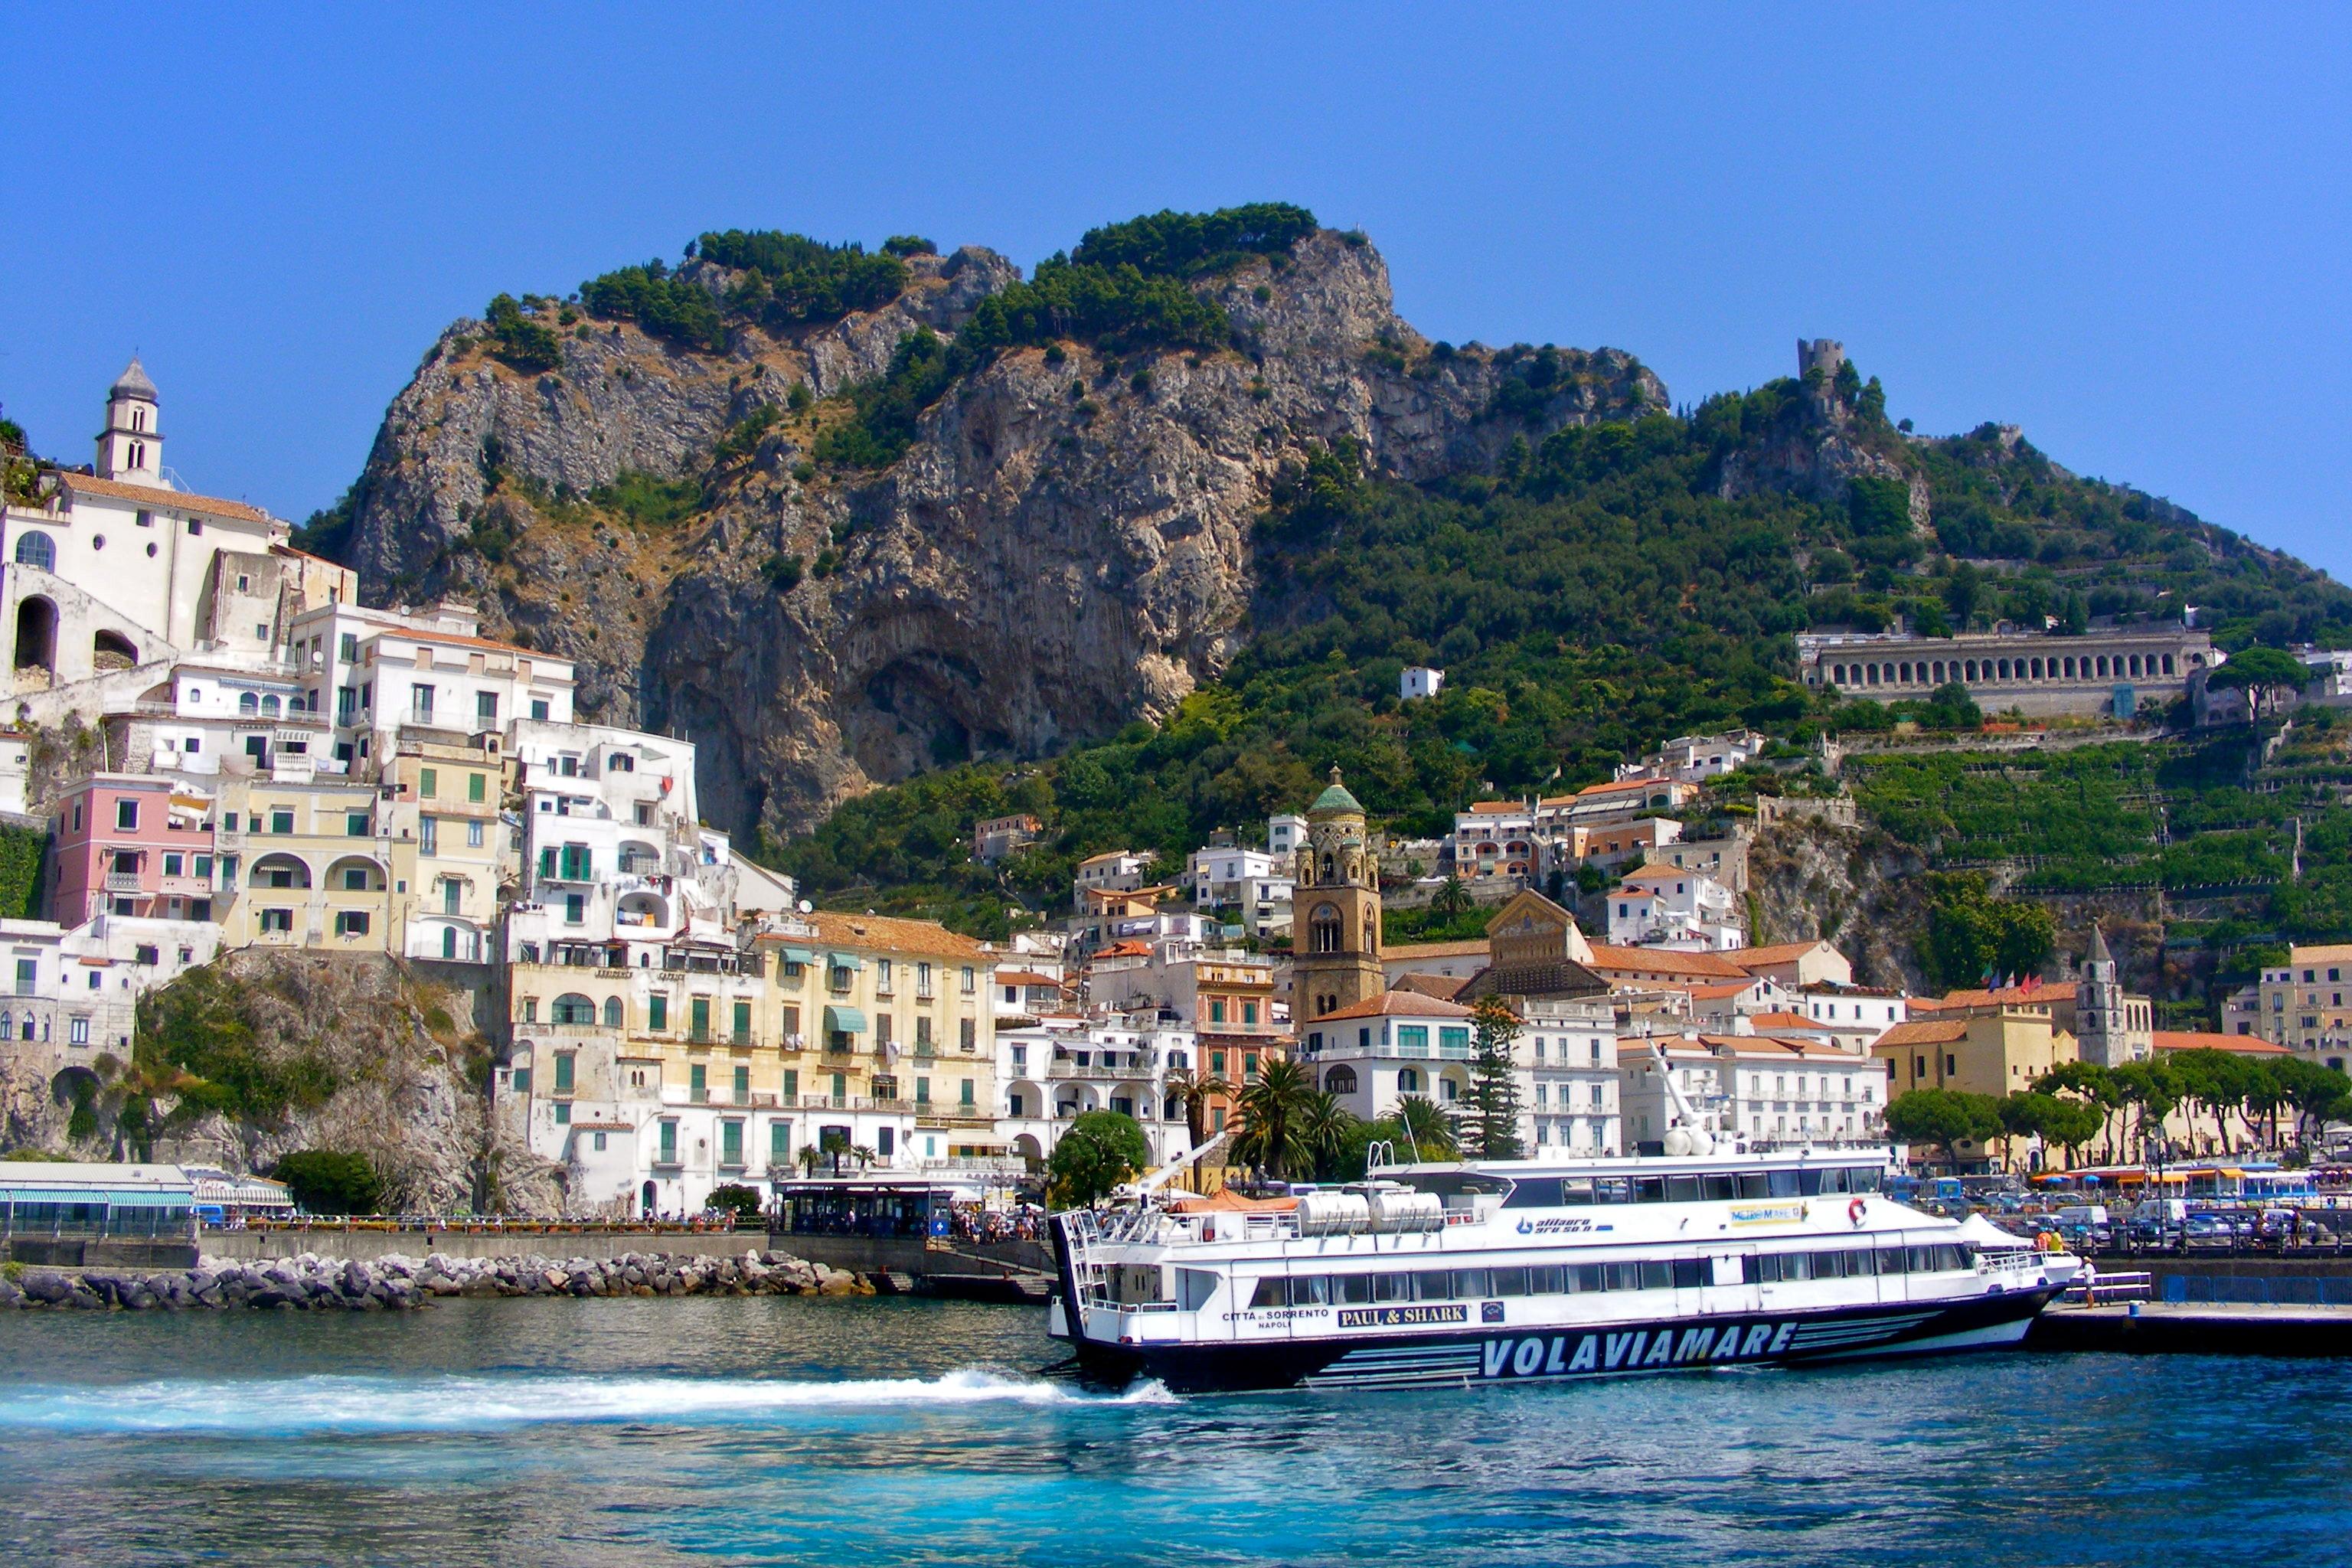 amalfi coast italy boat